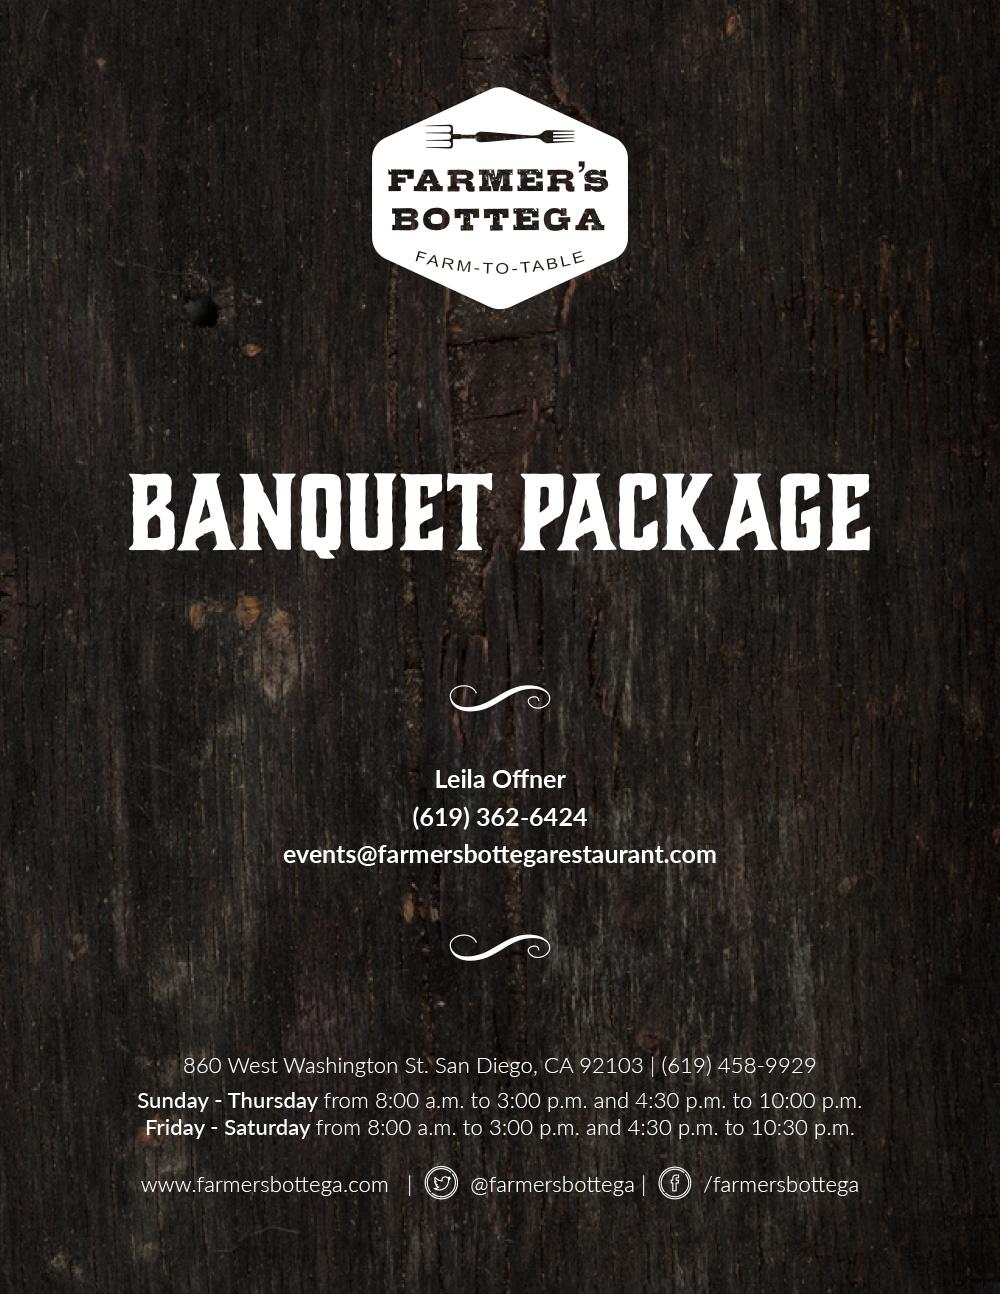 farmersbottega-banquetpdf-large-1.jpg